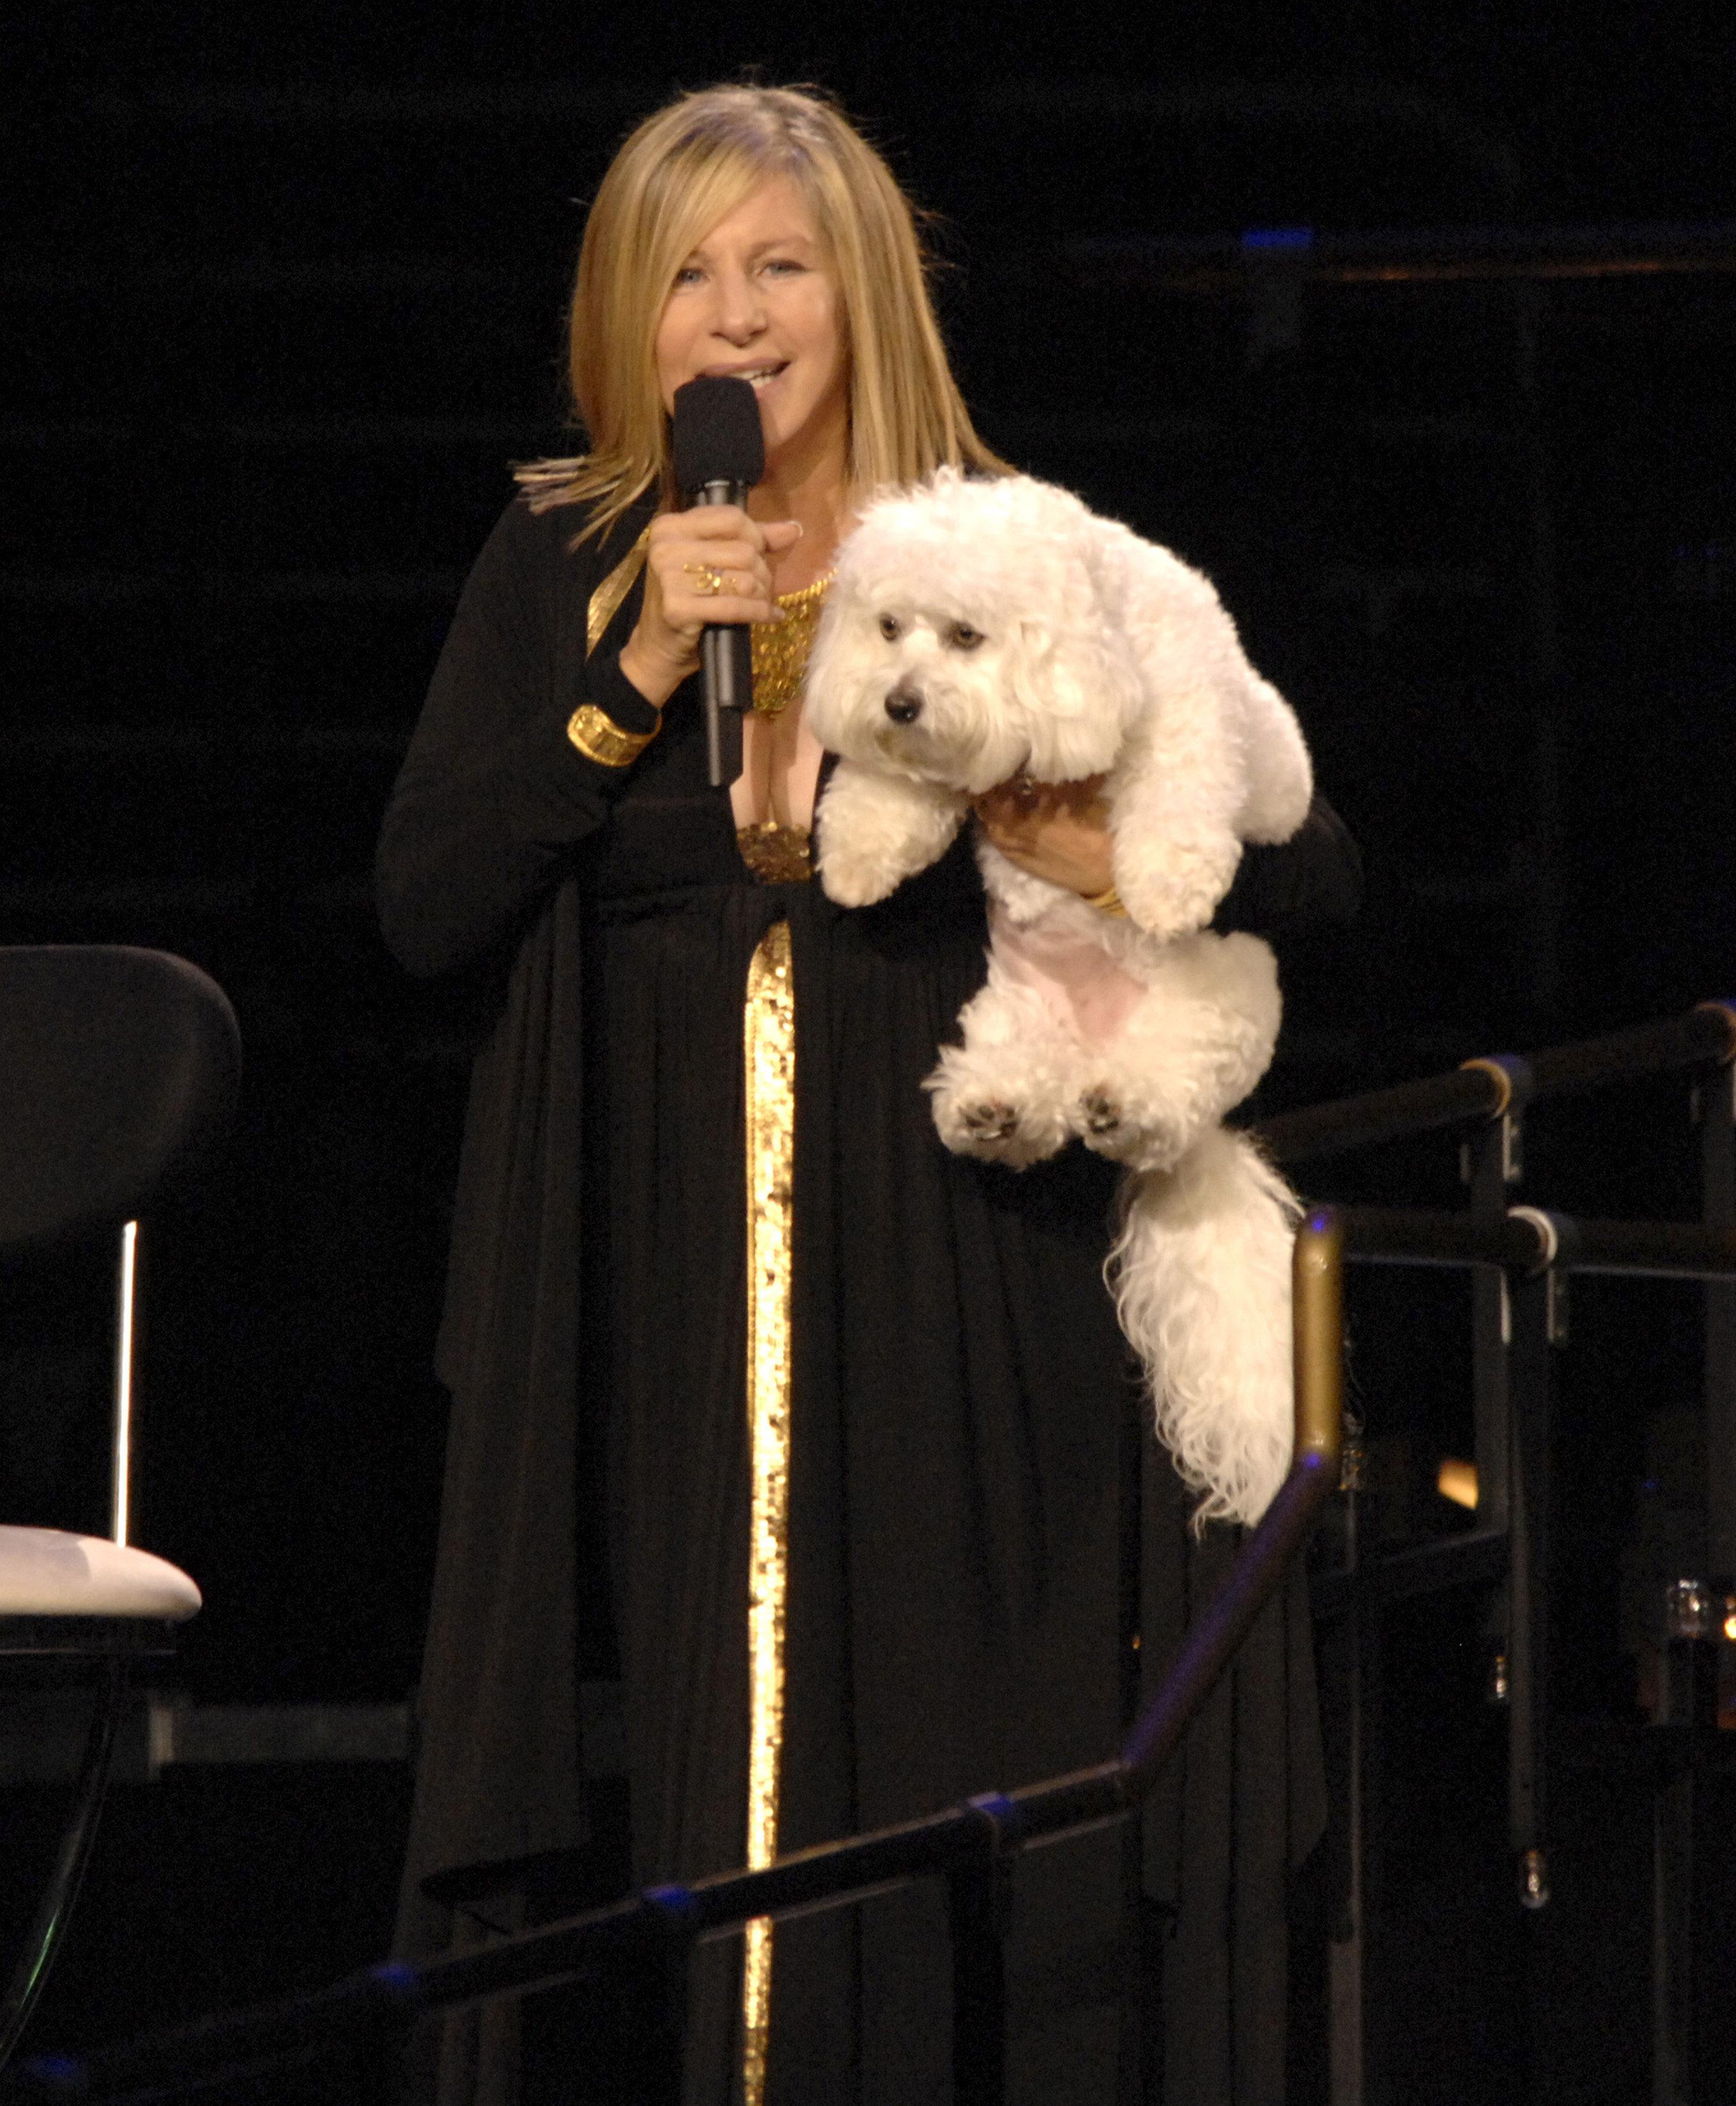 Barbra Streisand Cloned Her Beloved Pet Dog But PETA Aren't